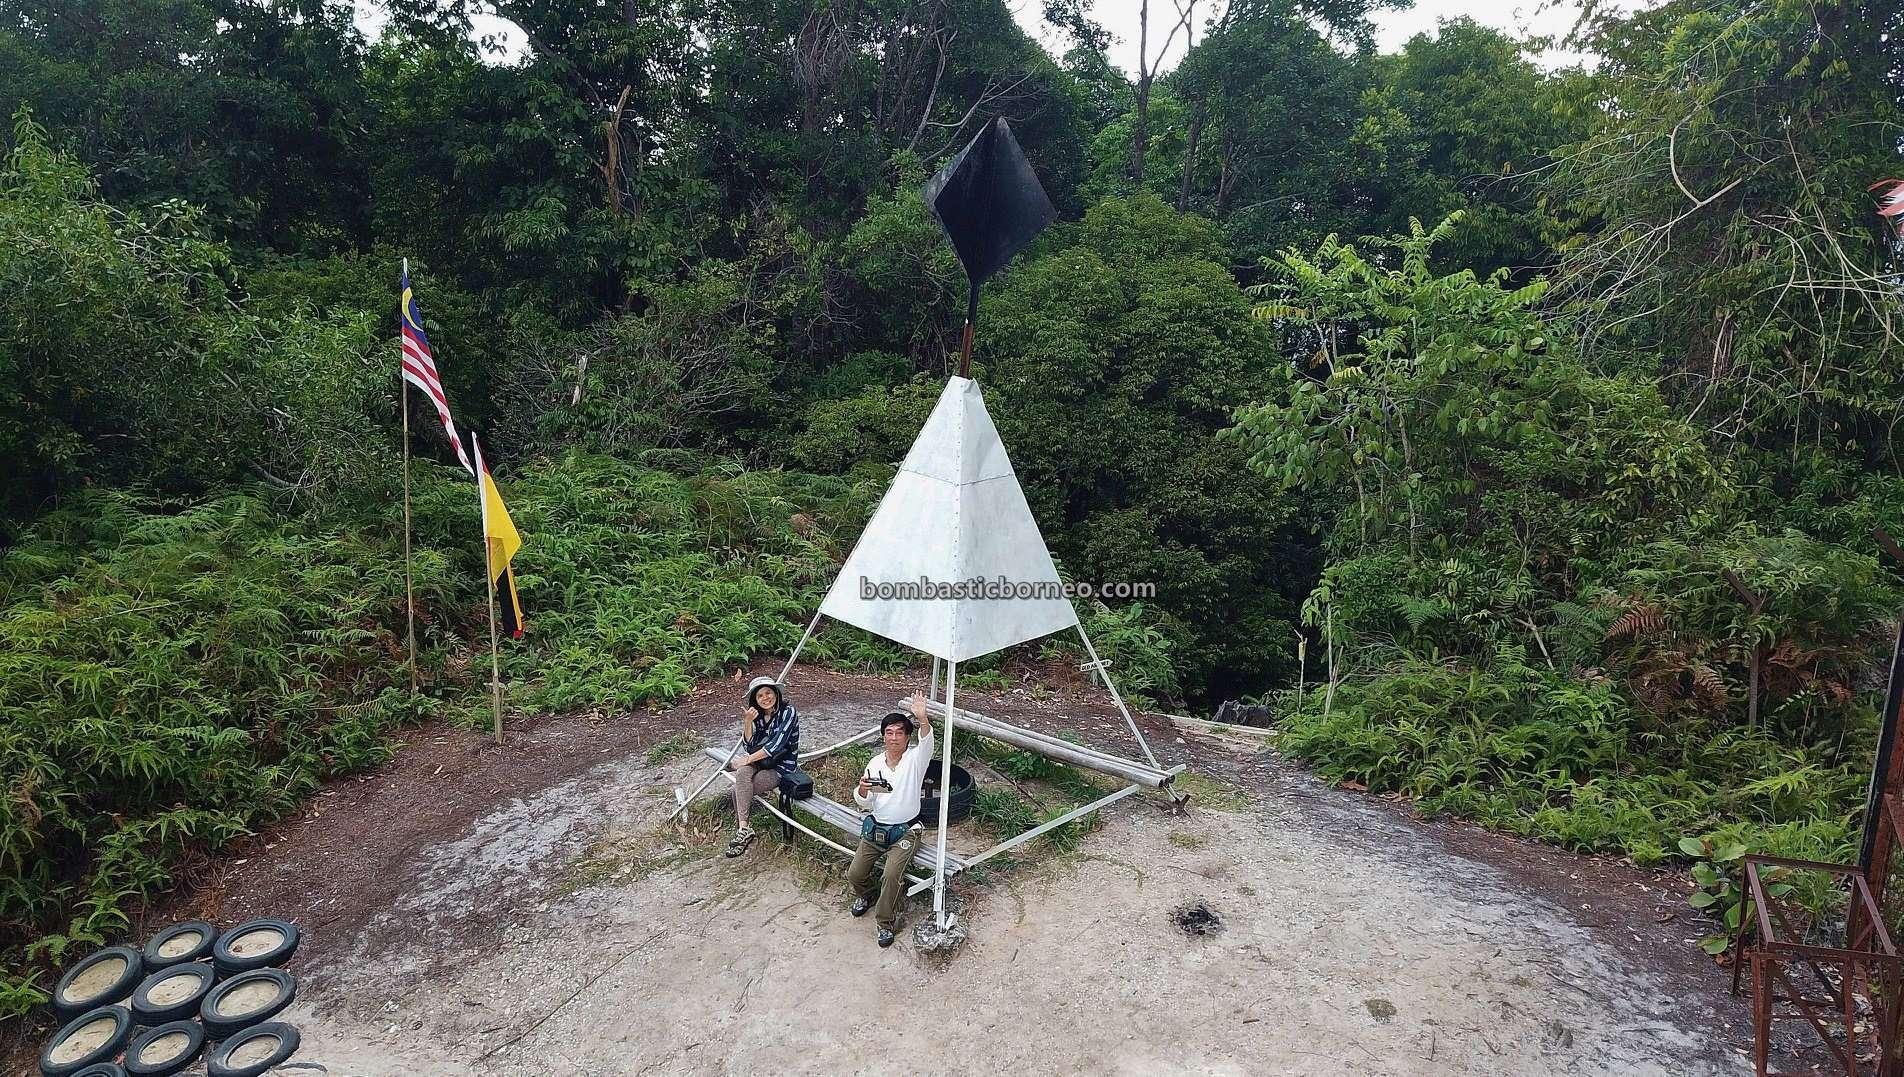 recreational park, trekking, hiking, adventure, nature, outdoor, backpackers, destination, exploration, Tourism, tourist attraction, Trans Borneo, 探索婆罗洲游踪, 马来西亚砂拉越, 林梦旅游景点,